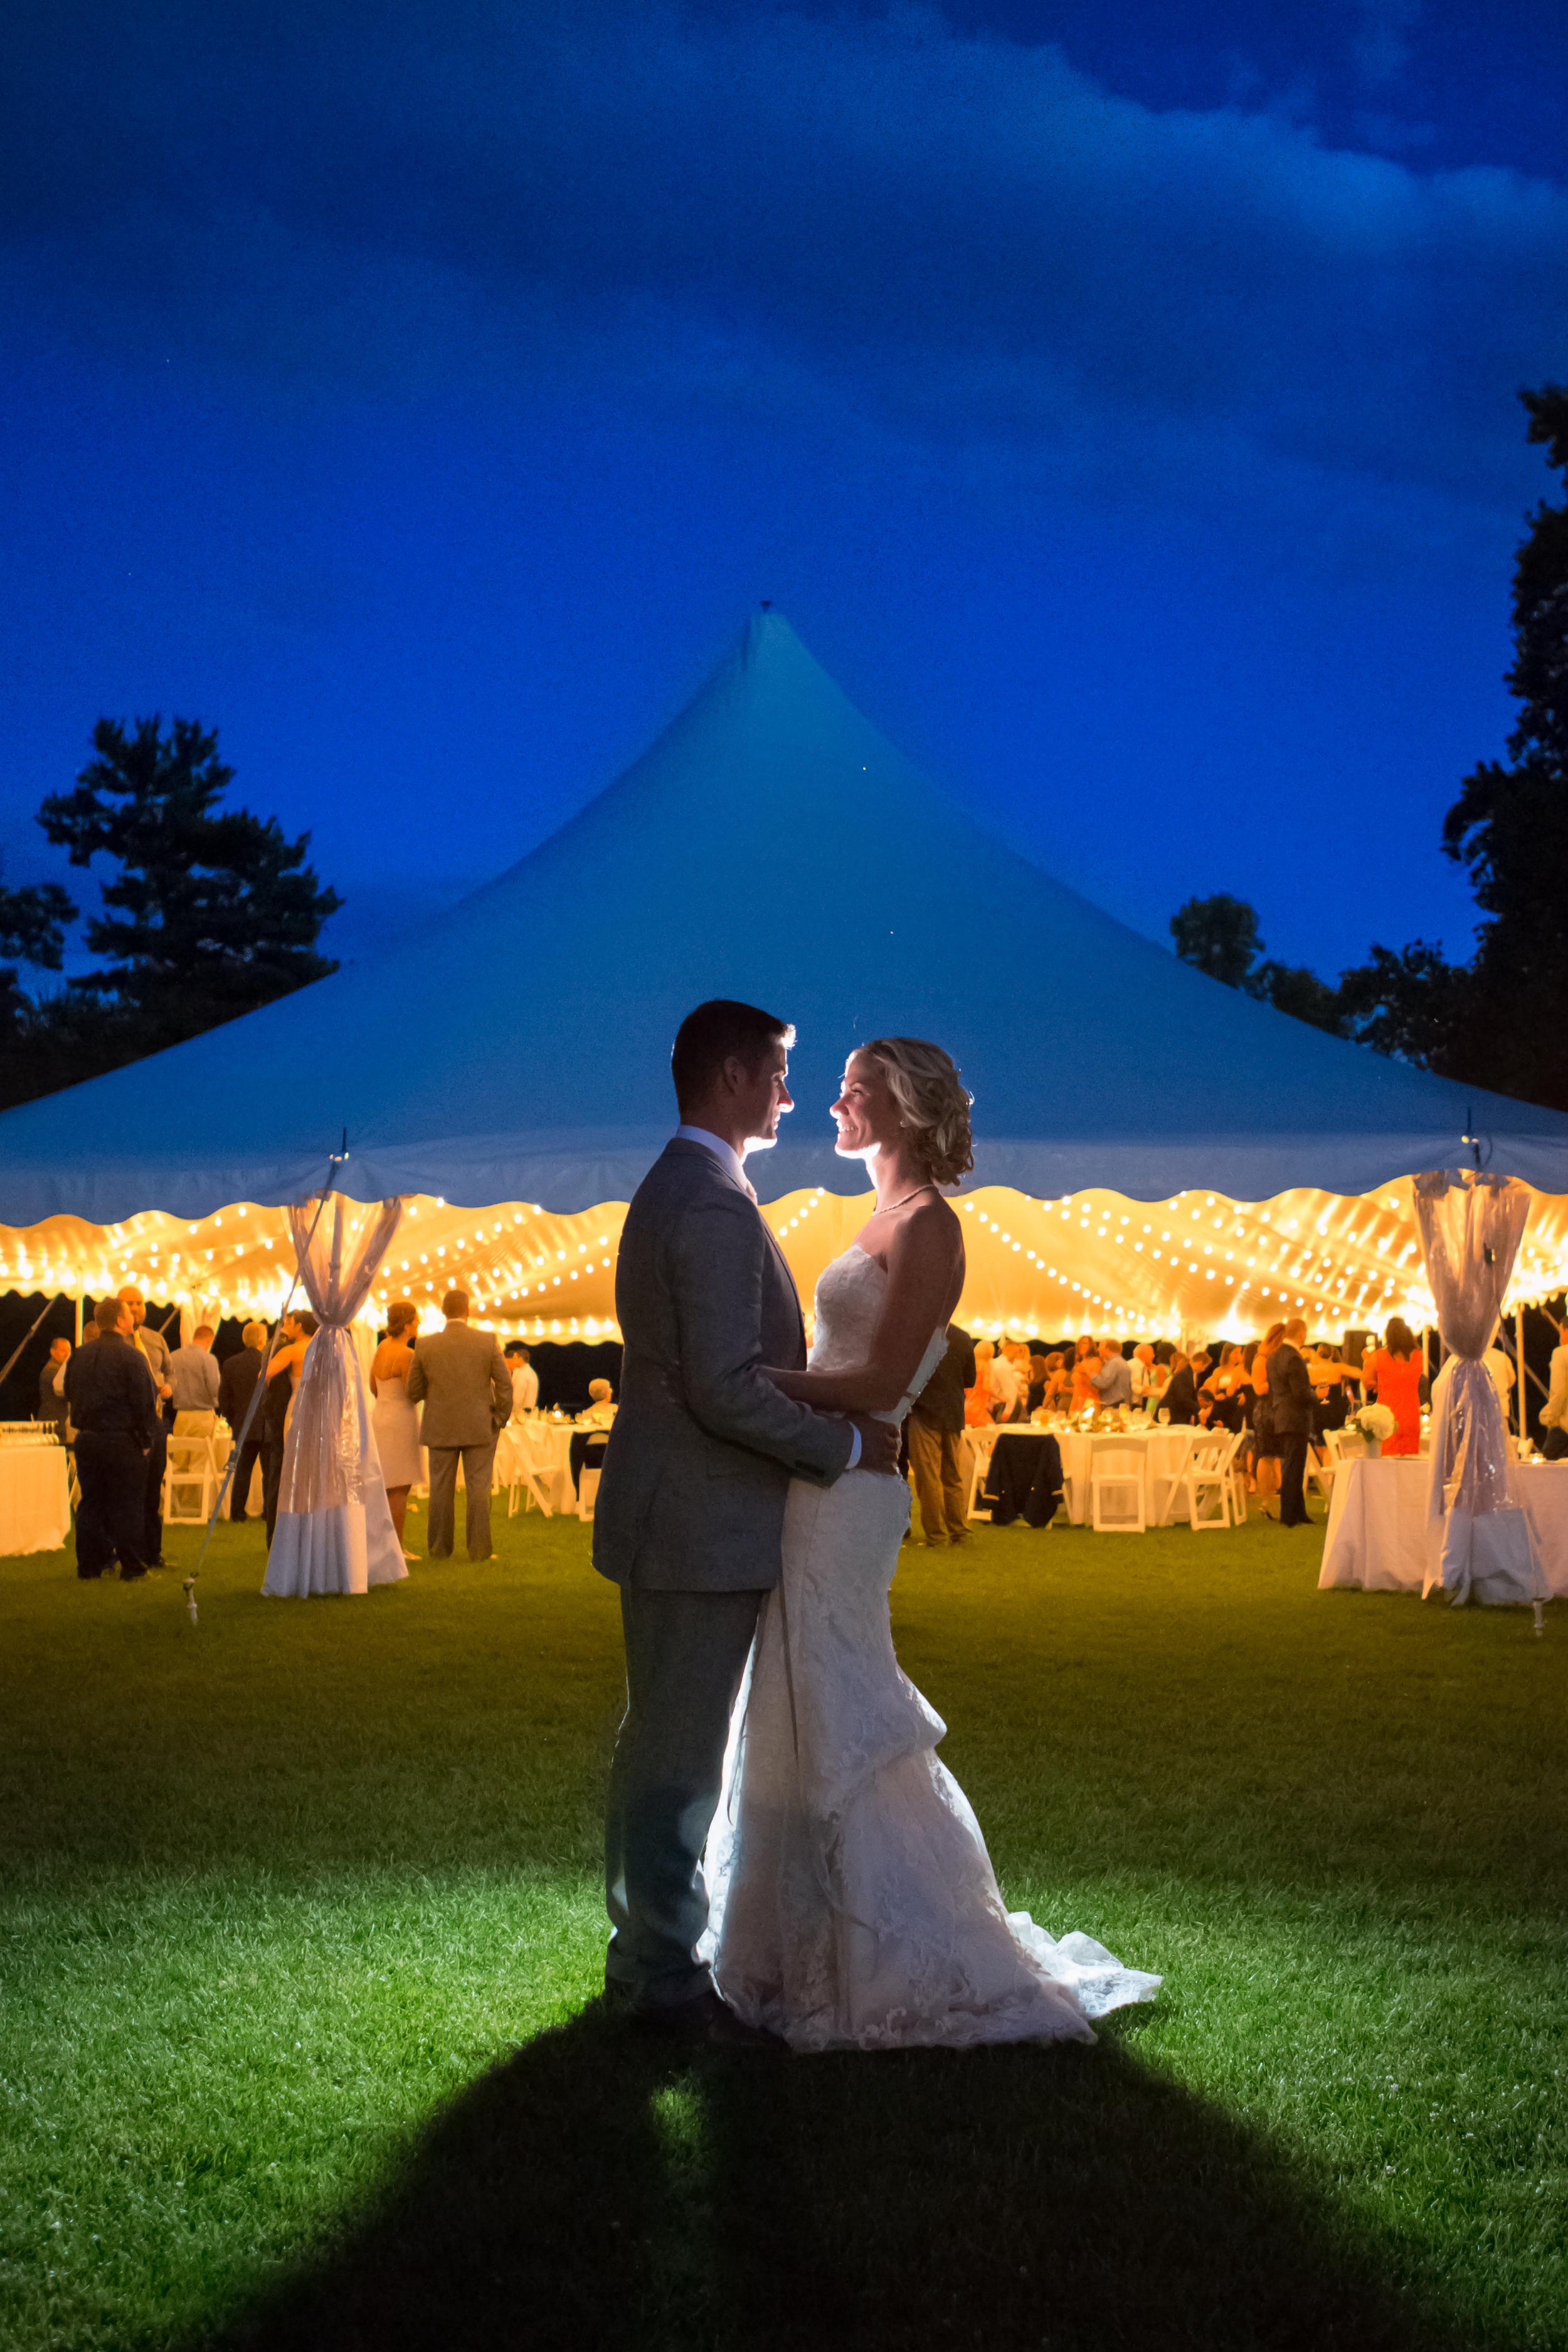 wedding night photo blue sky  romantic moraine farm bevrly ma .jpg